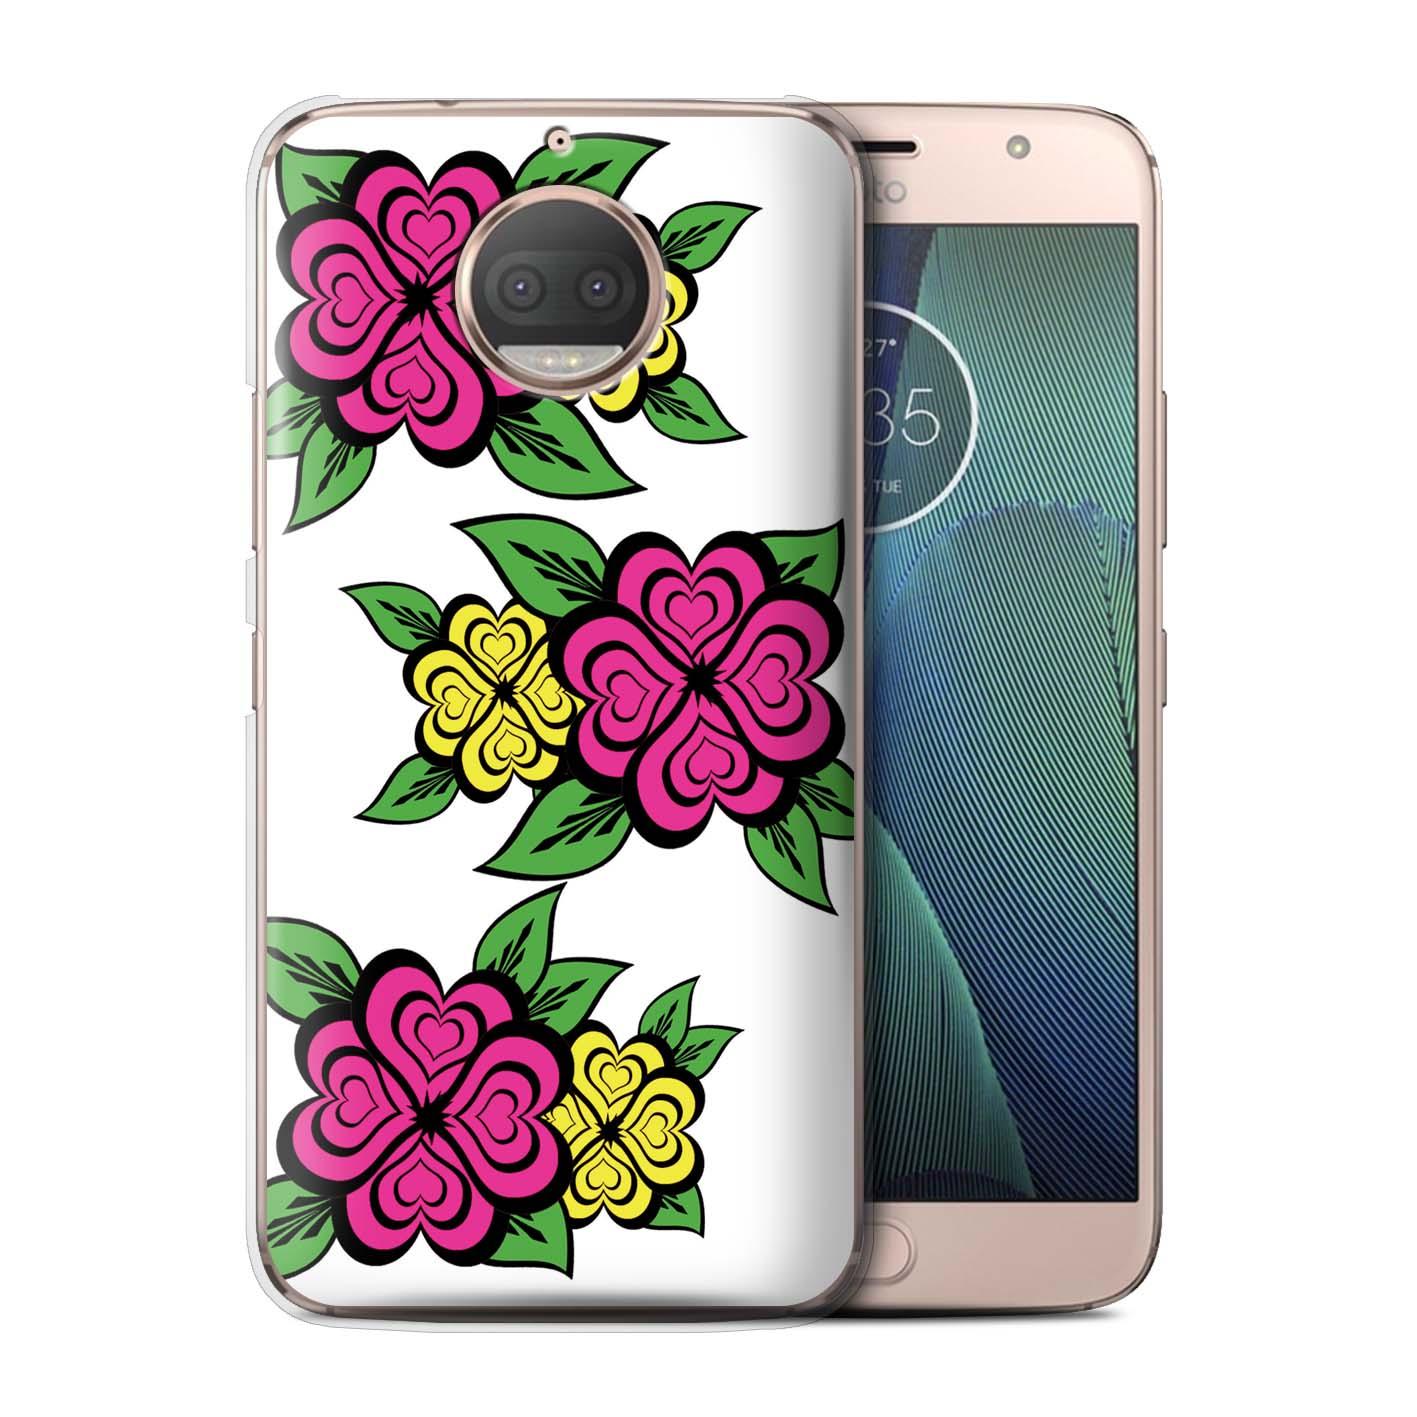 Stuff4-Huelle-Case-Backcover-fuer-Motorola-Moto-G5S-Plus-Liebe-Herz-Rosen